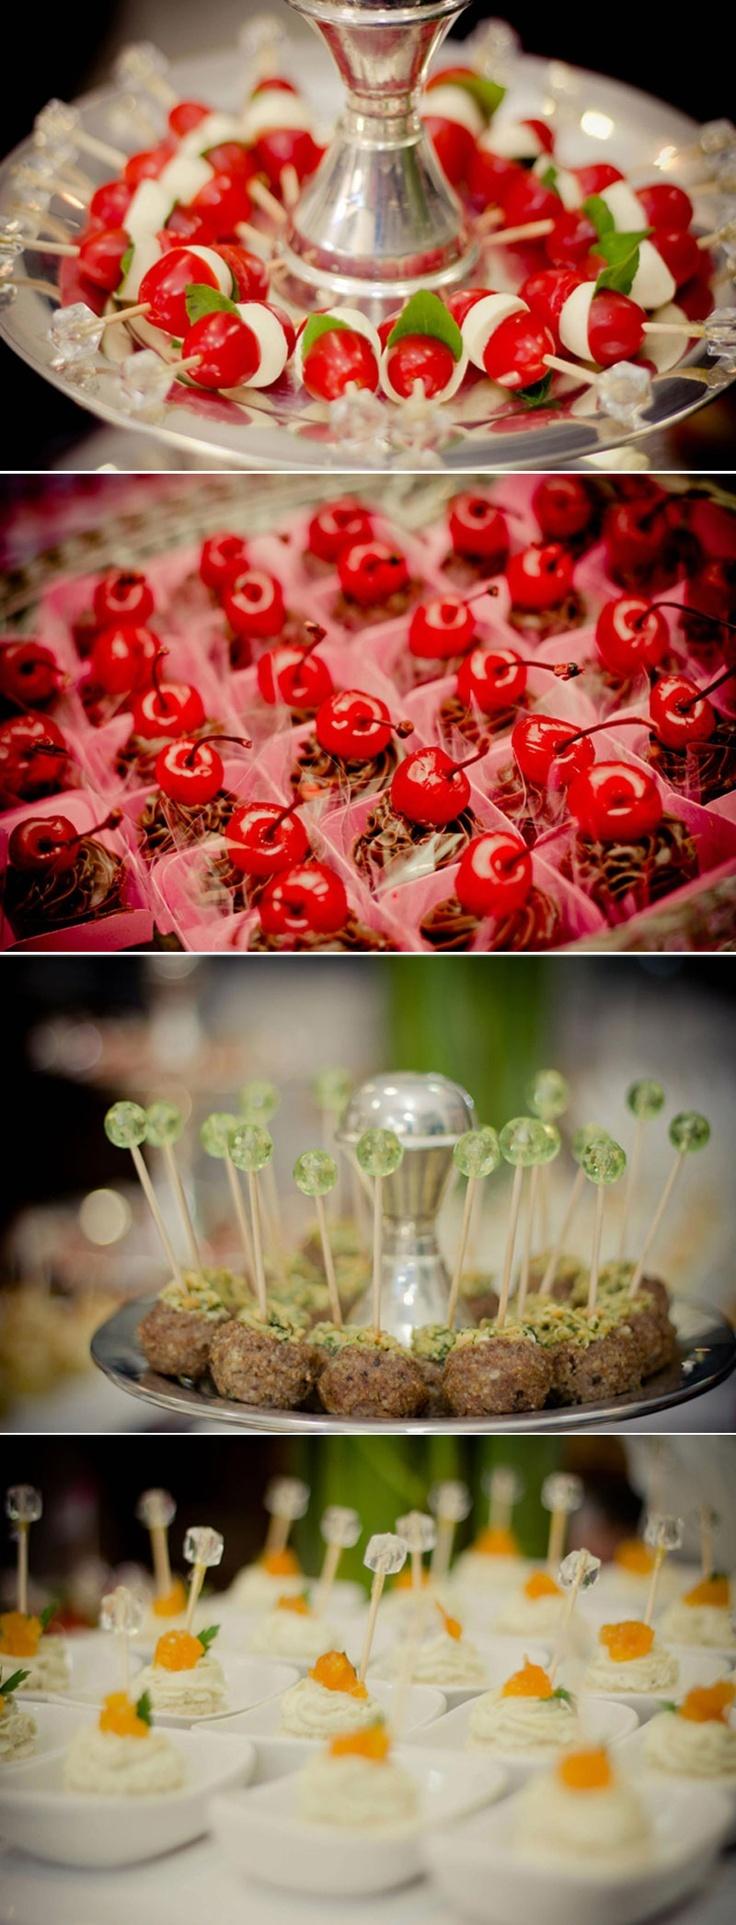 Cute finger foods ideas. Beautiful presentations